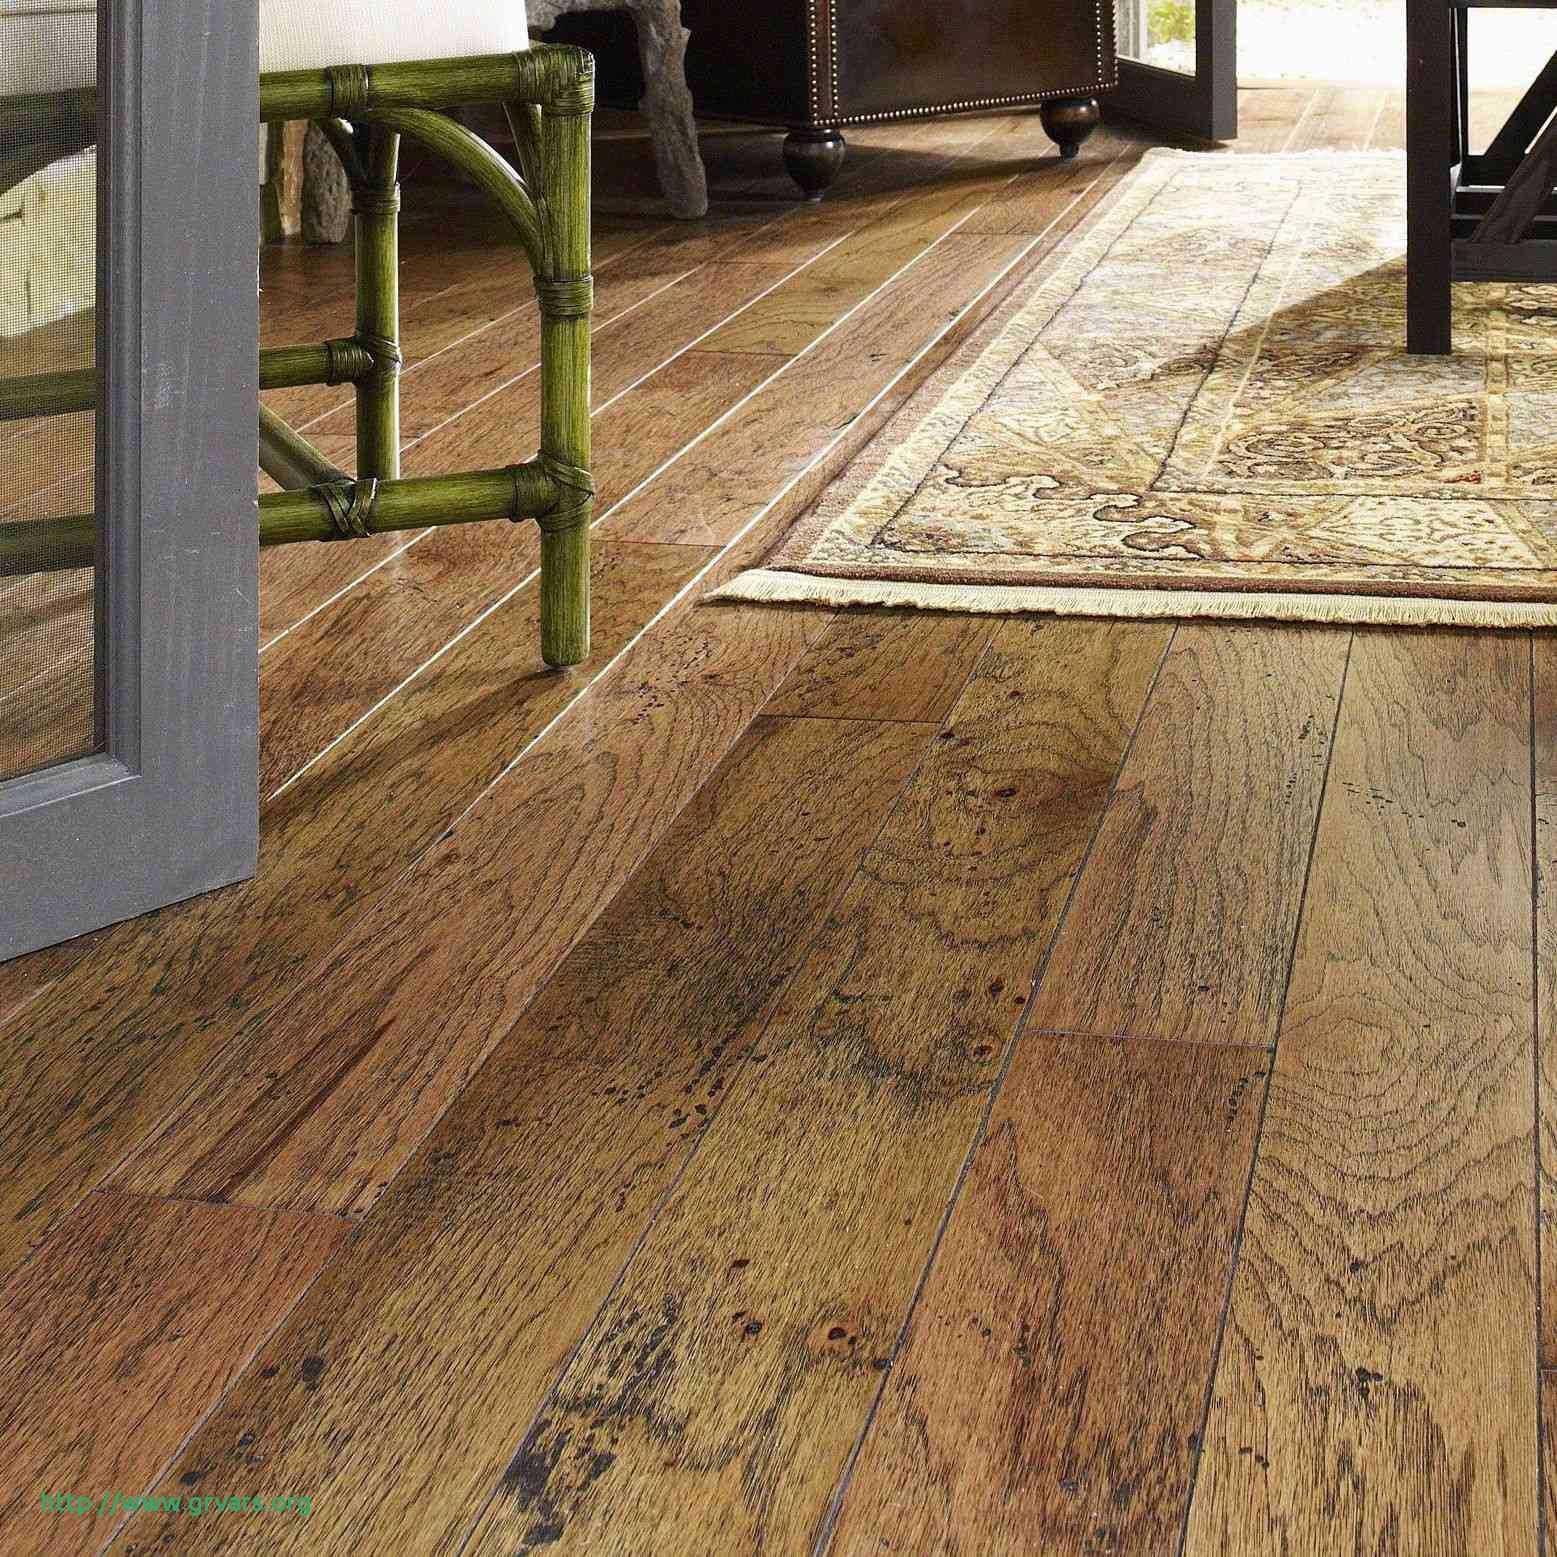 hardwood floor protectors for beds of 25 beau fore wood floors ideas blog in fore wood floors inspirant hardwood floor wood furniture protectors for hardwood floors